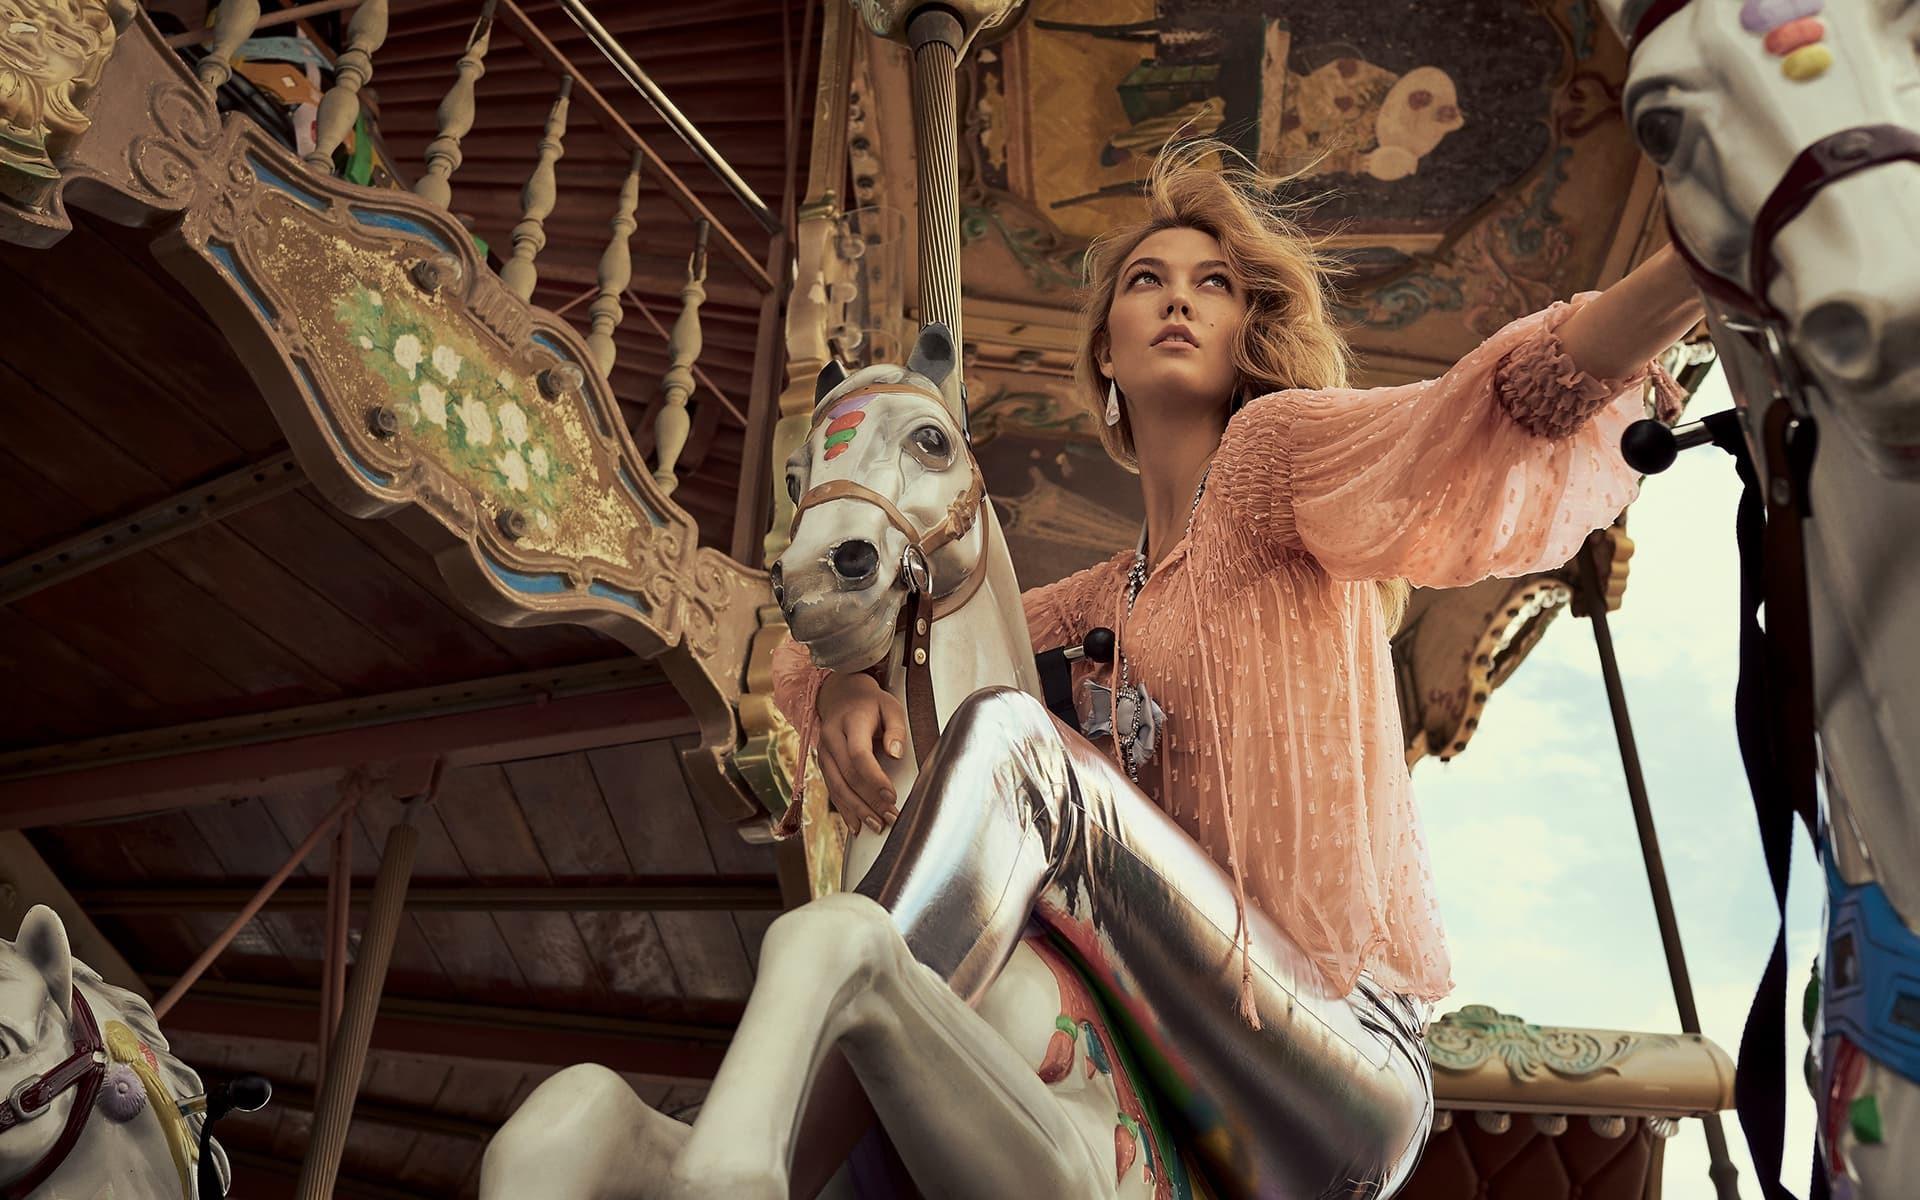 Karlie Kloss Free Download